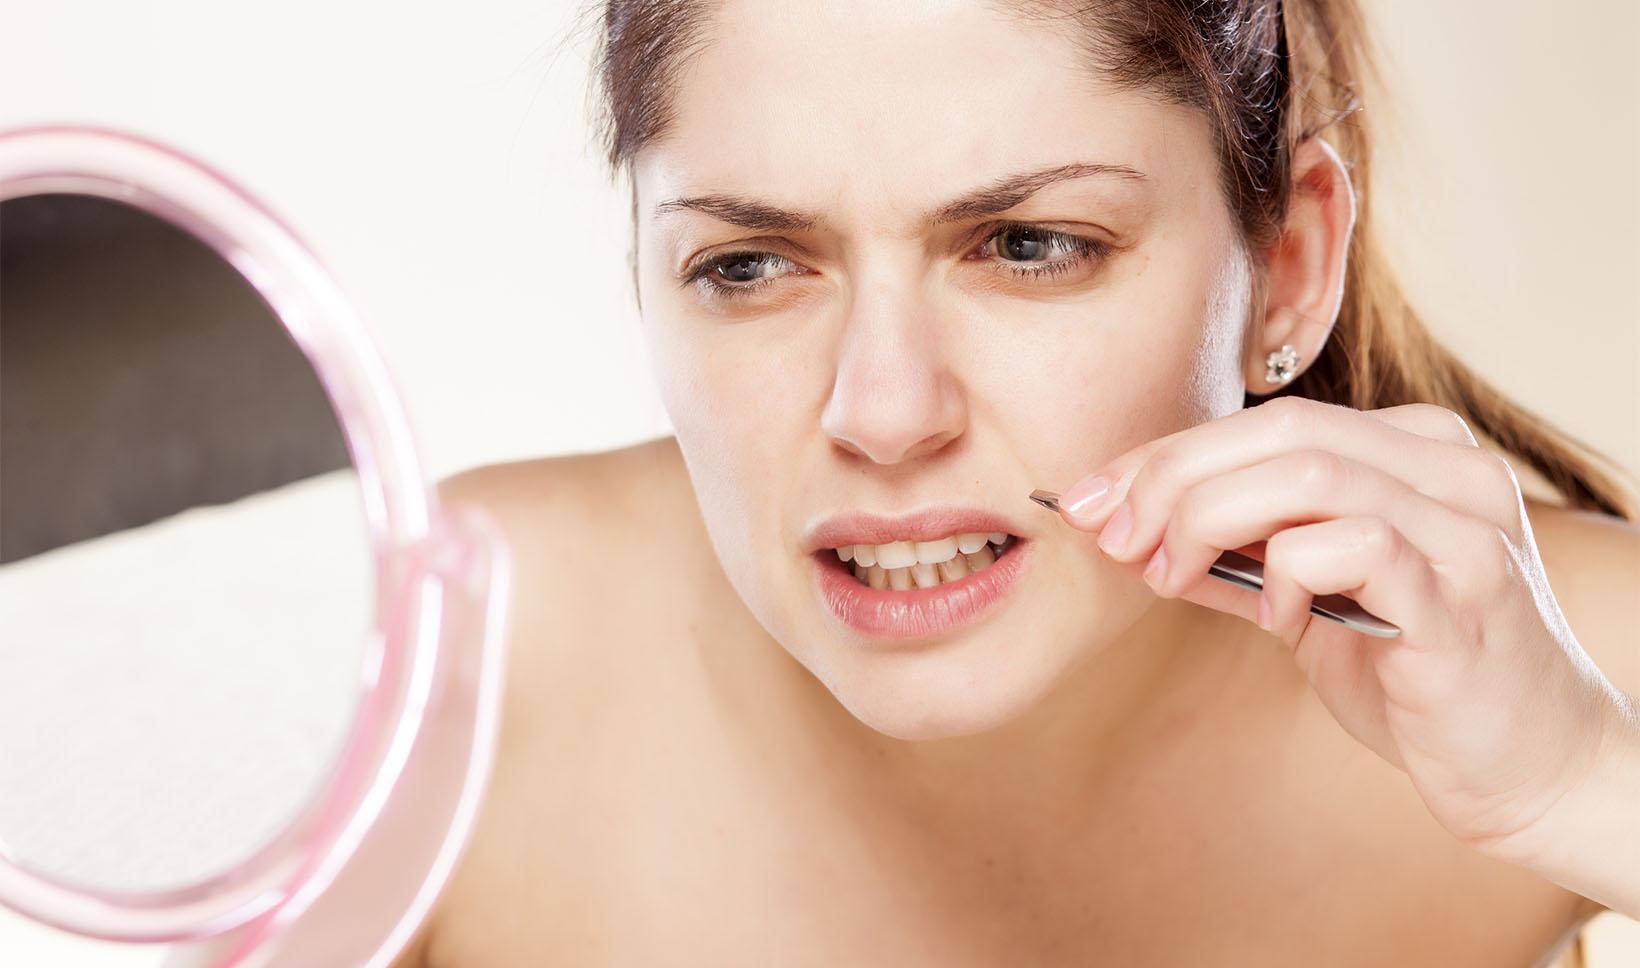 Facial Hair: Hormones, Genetics, or Both?